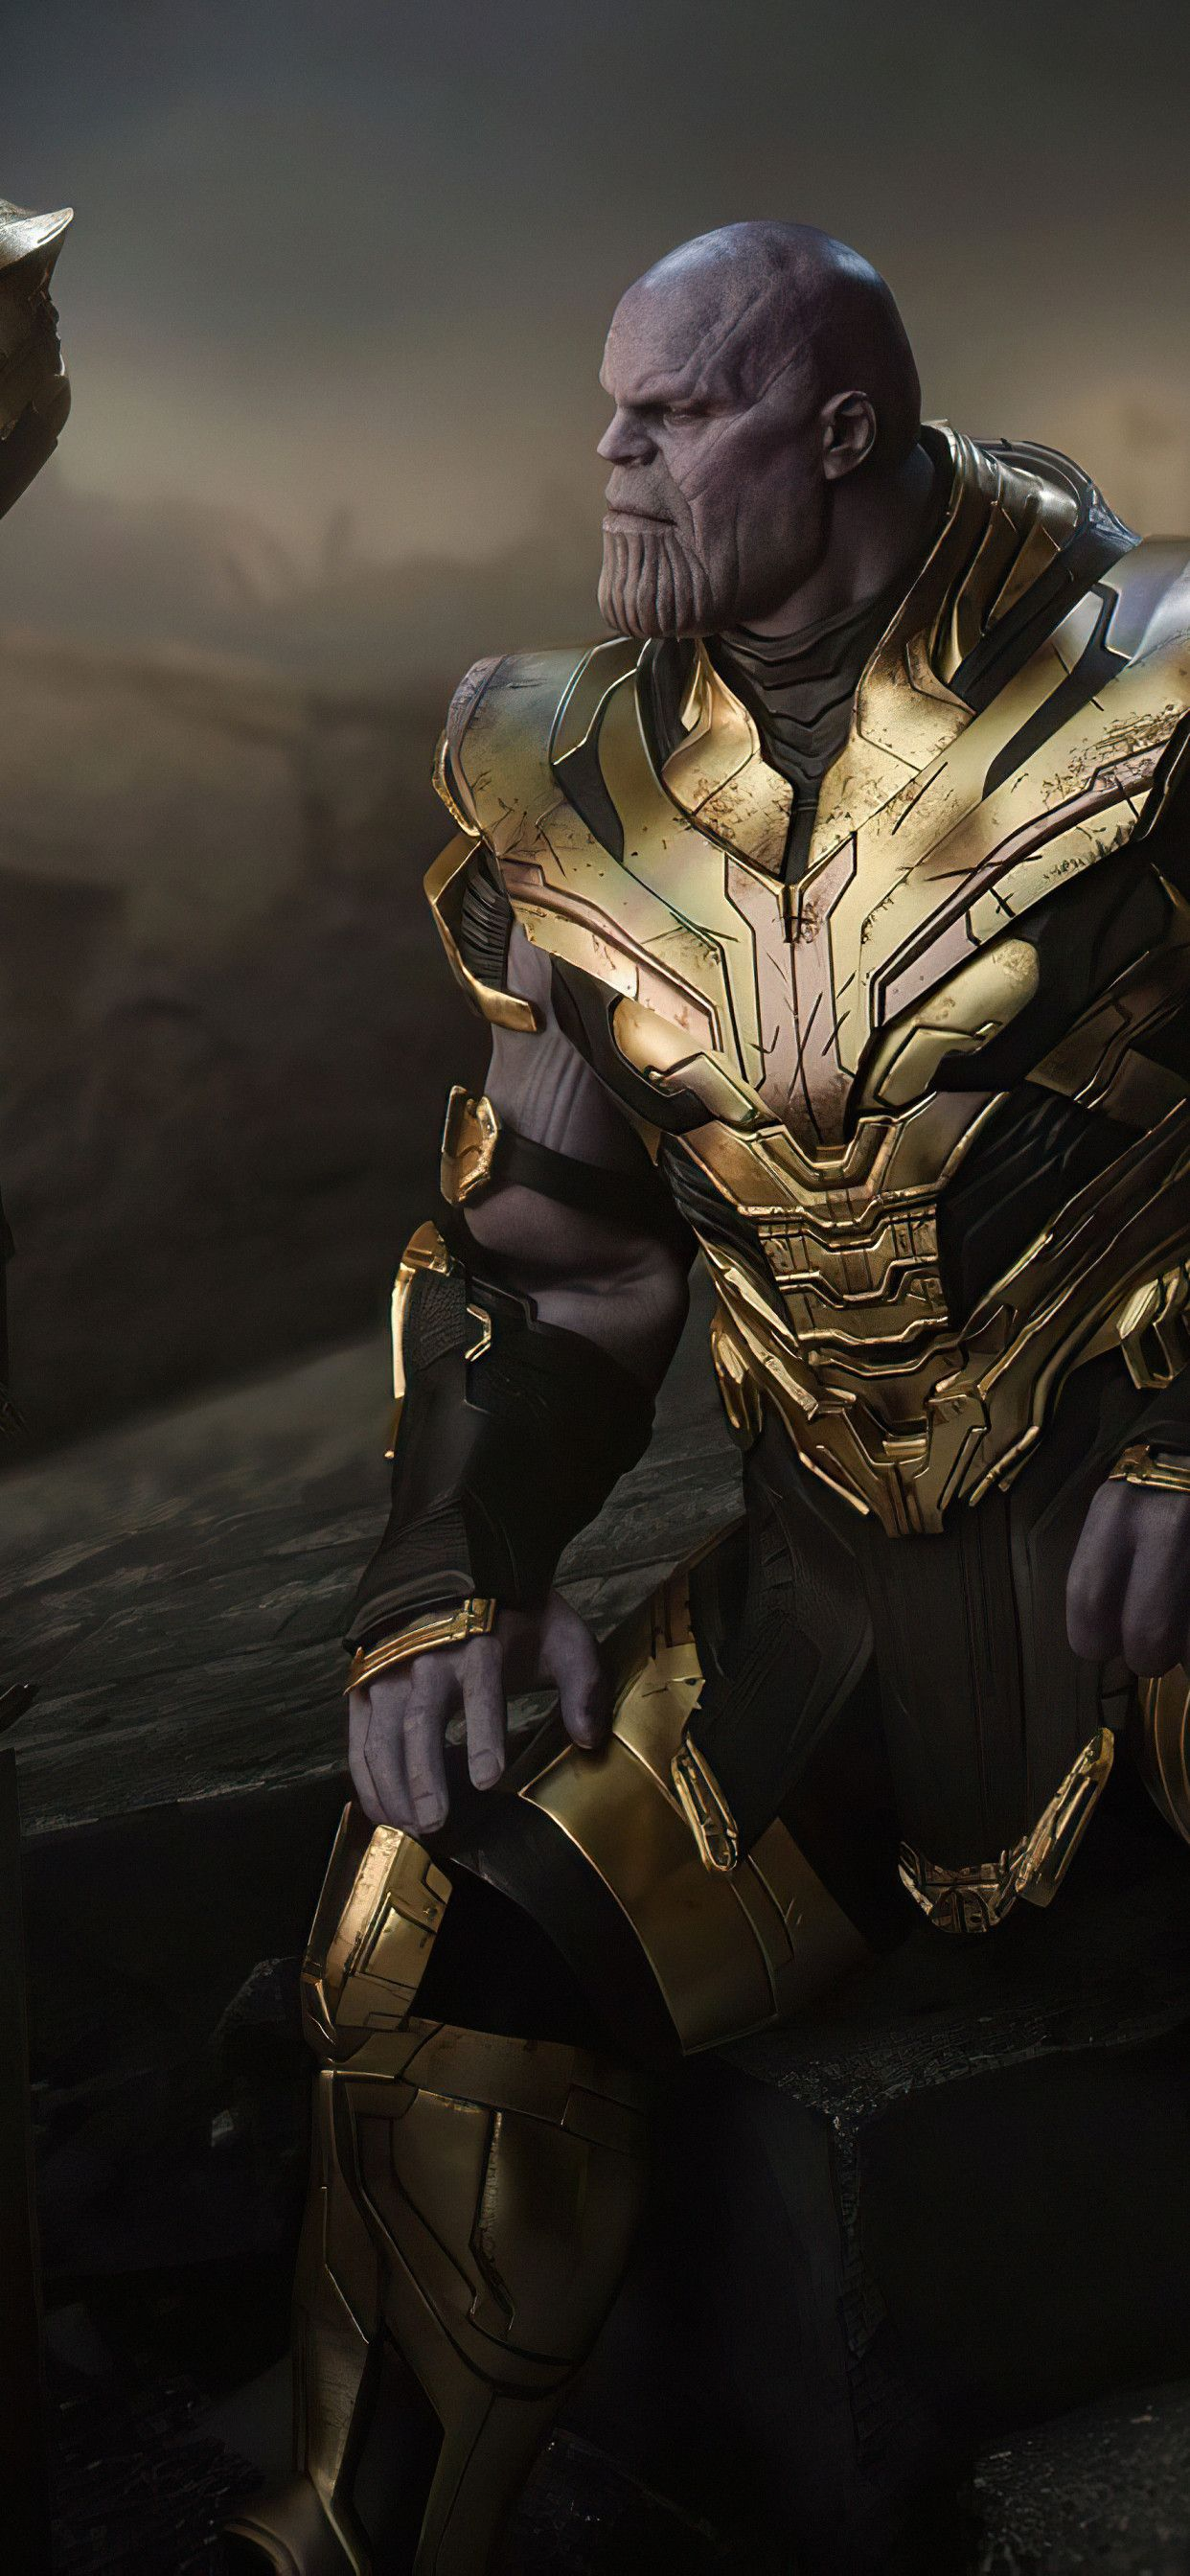 Thanos Sword Wallpapers - Wallpaper Cave